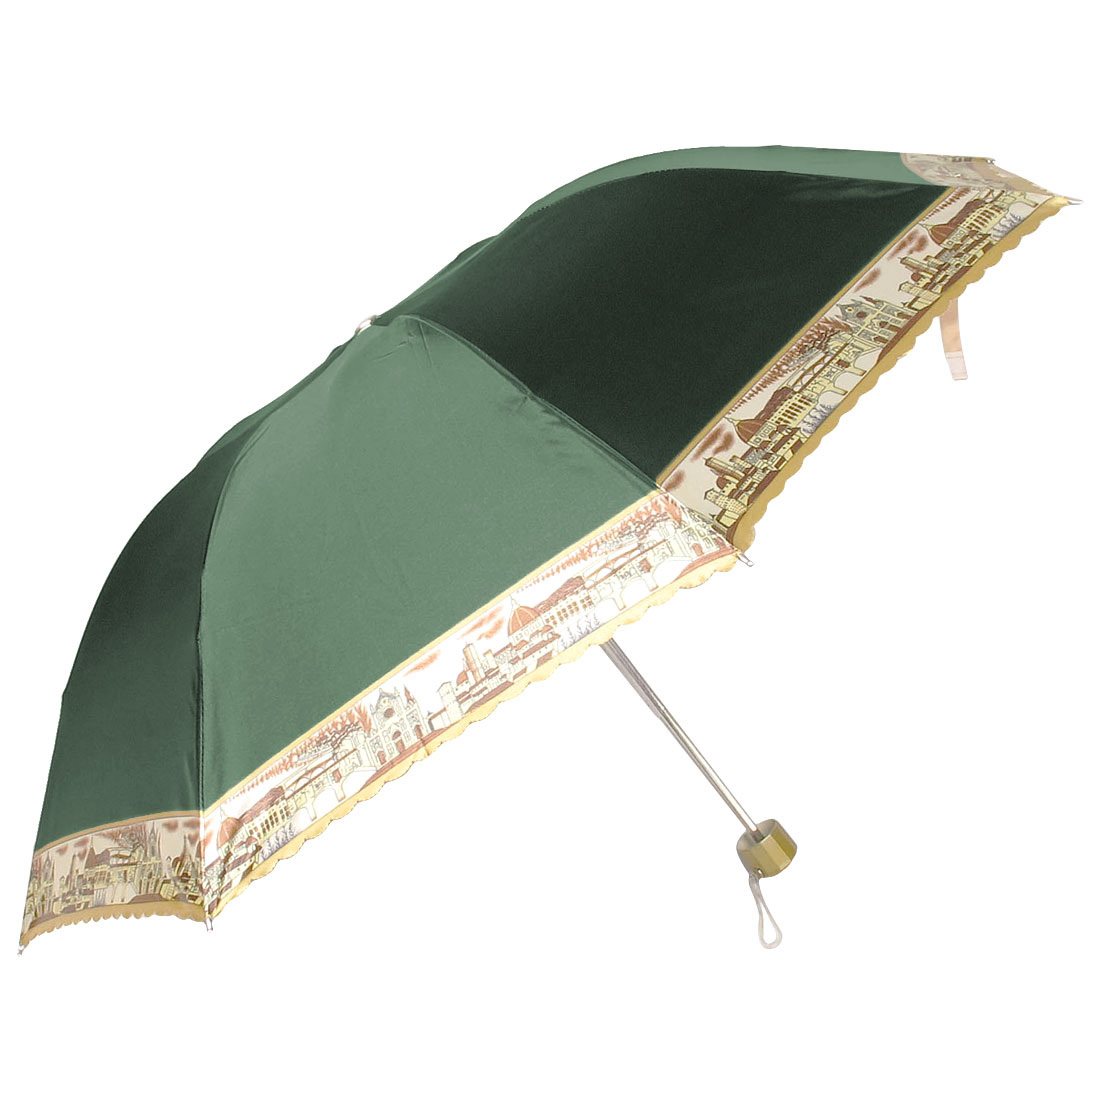 Outdoor Handy Foldable Green Nylon Western Town Print Rain Sun Umbrella